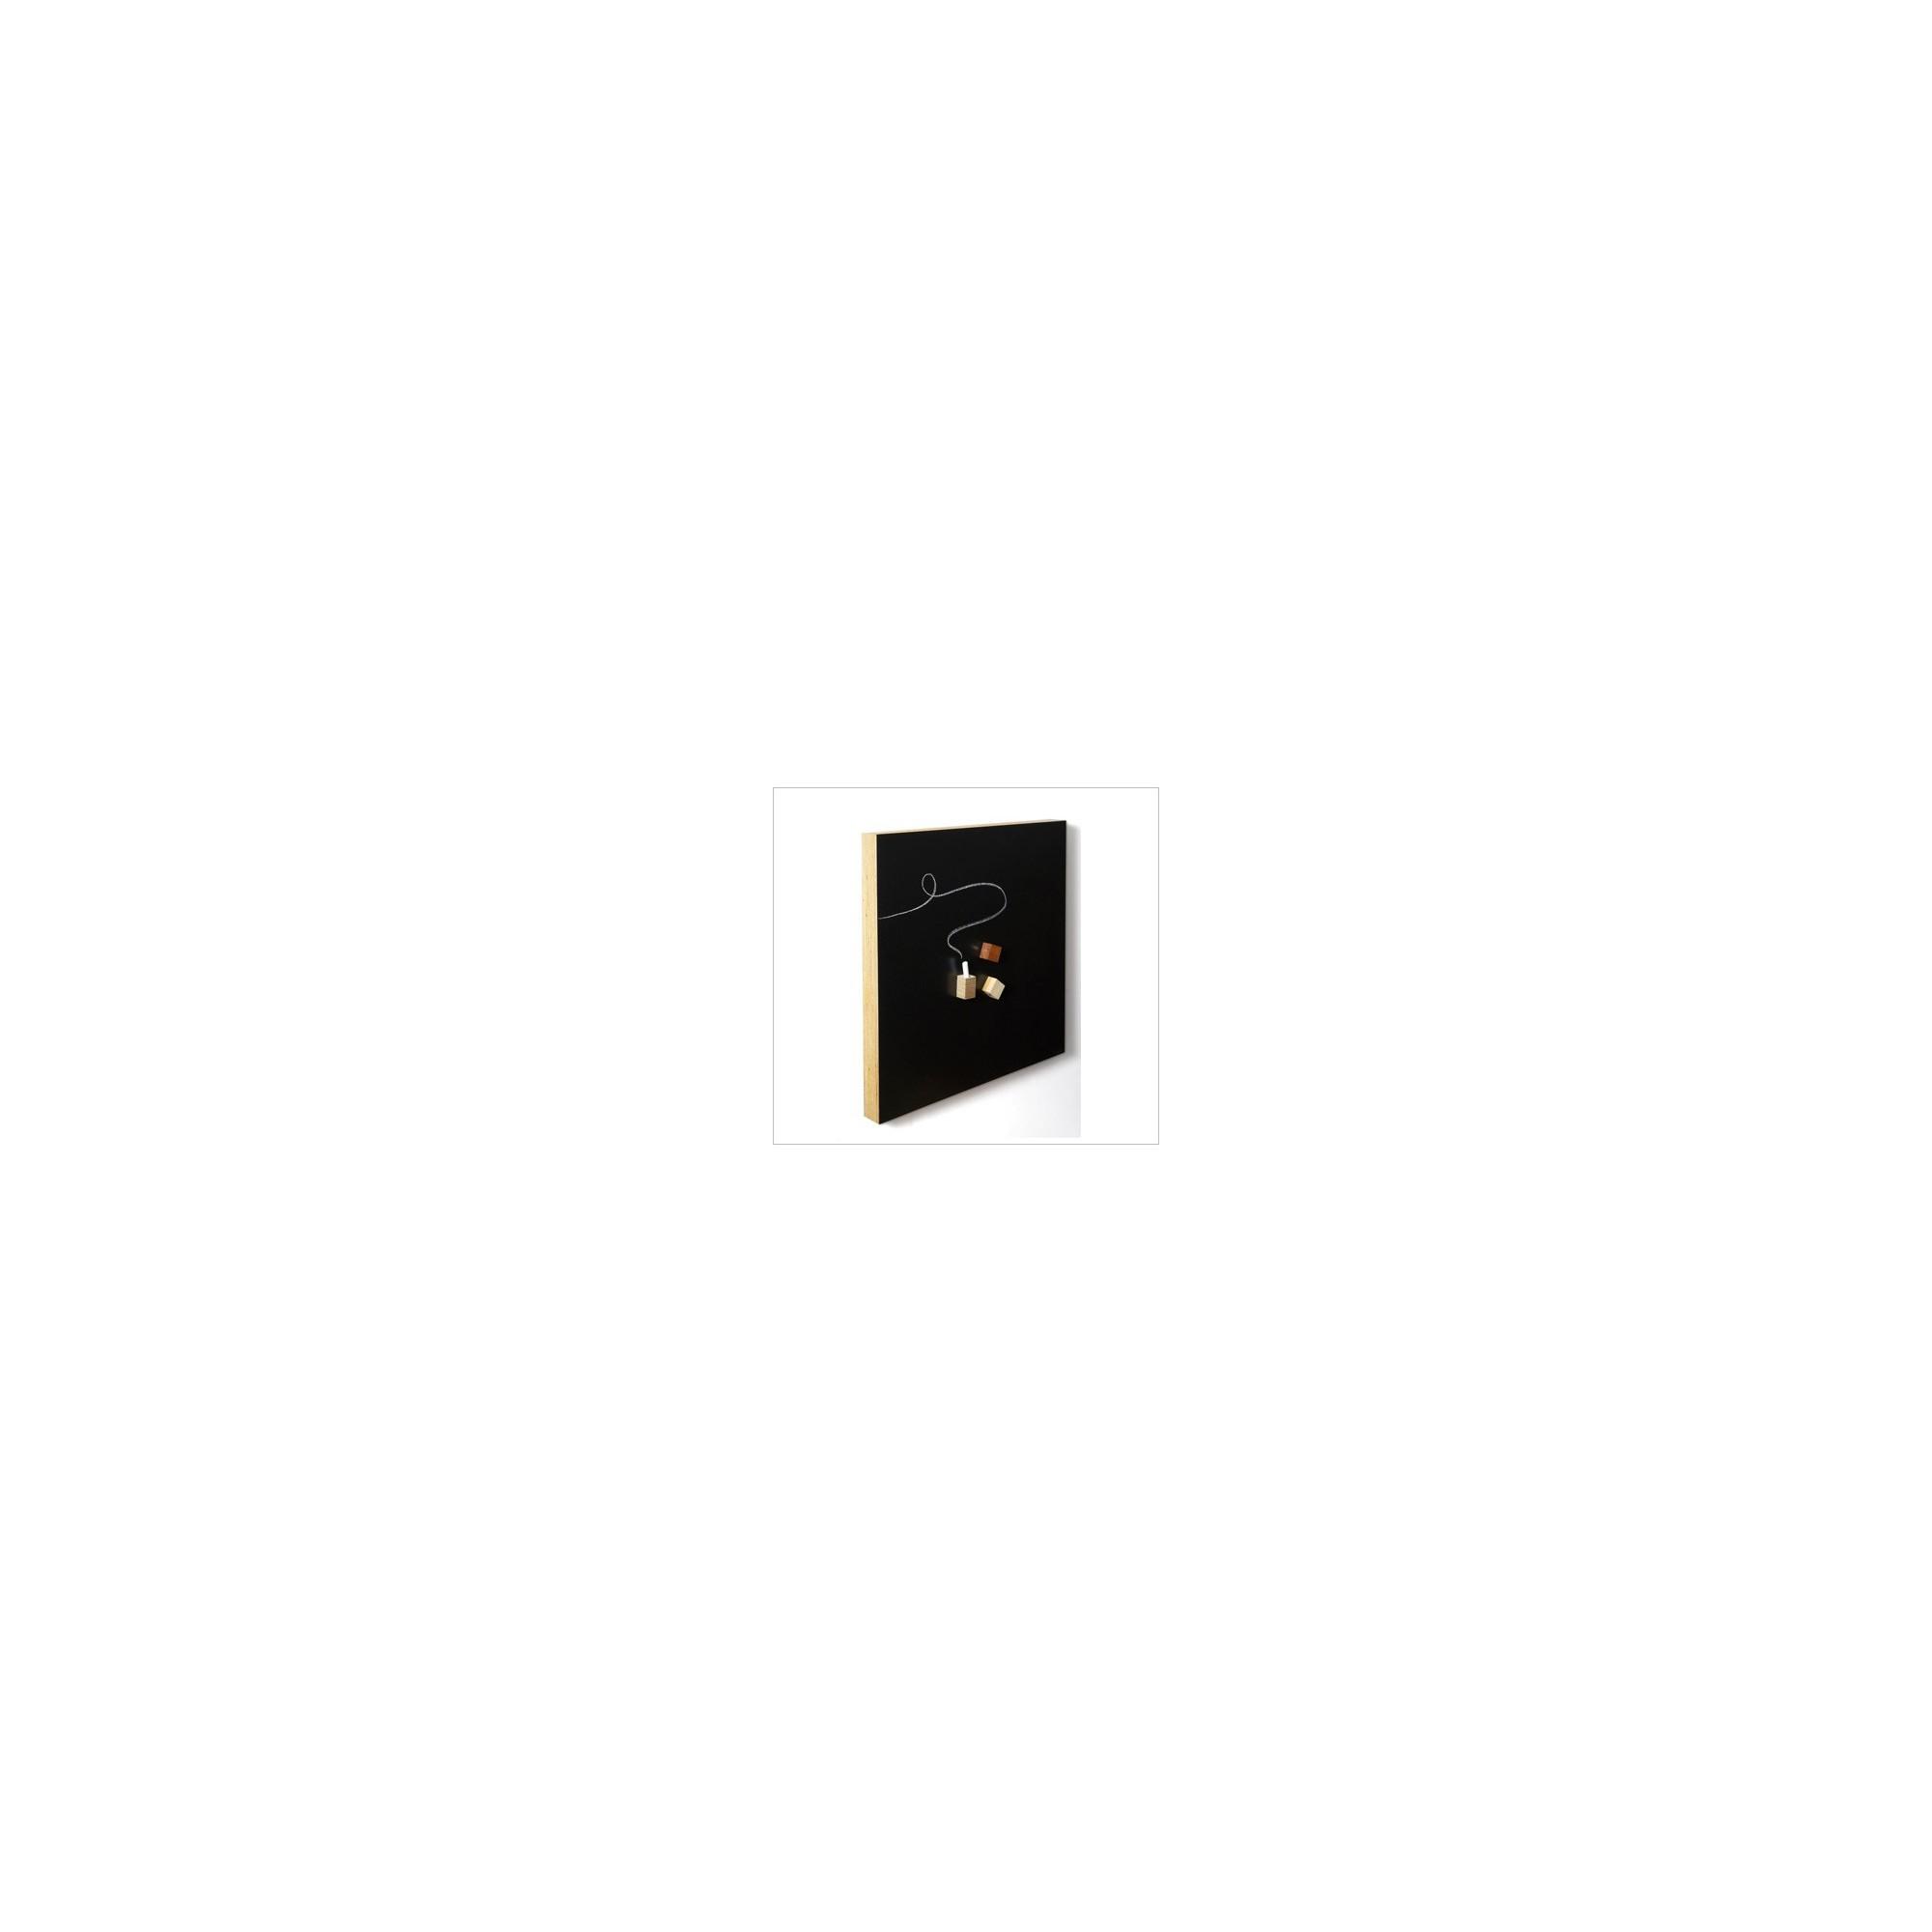 tableau noir magn tique carr 500 x 500 x 40 mm tableaux. Black Bedroom Furniture Sets. Home Design Ideas